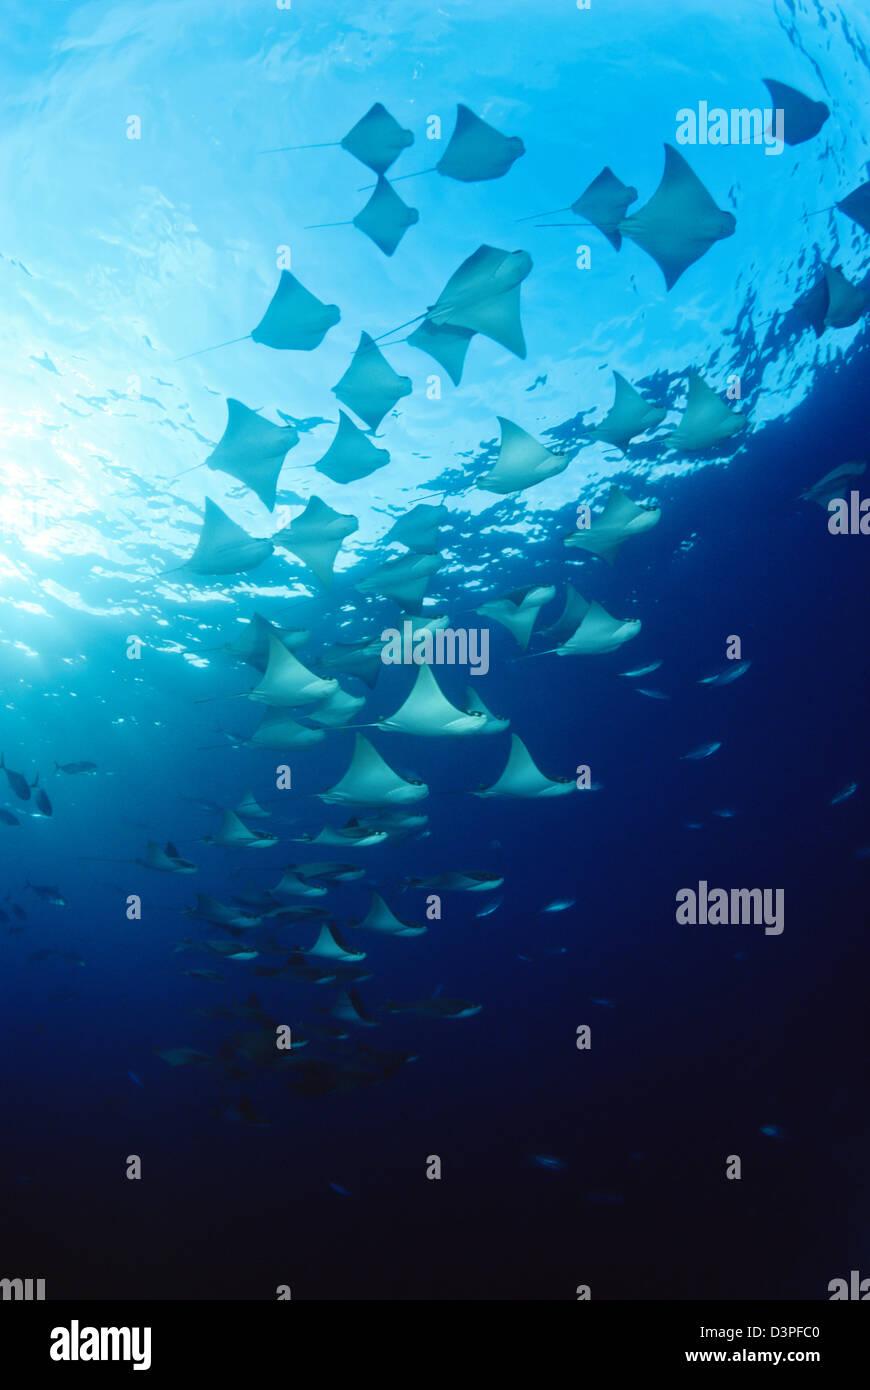 Cownose rays, Rhinoptera steindachneri, Galapagos Islands, Equador. - Stock Image